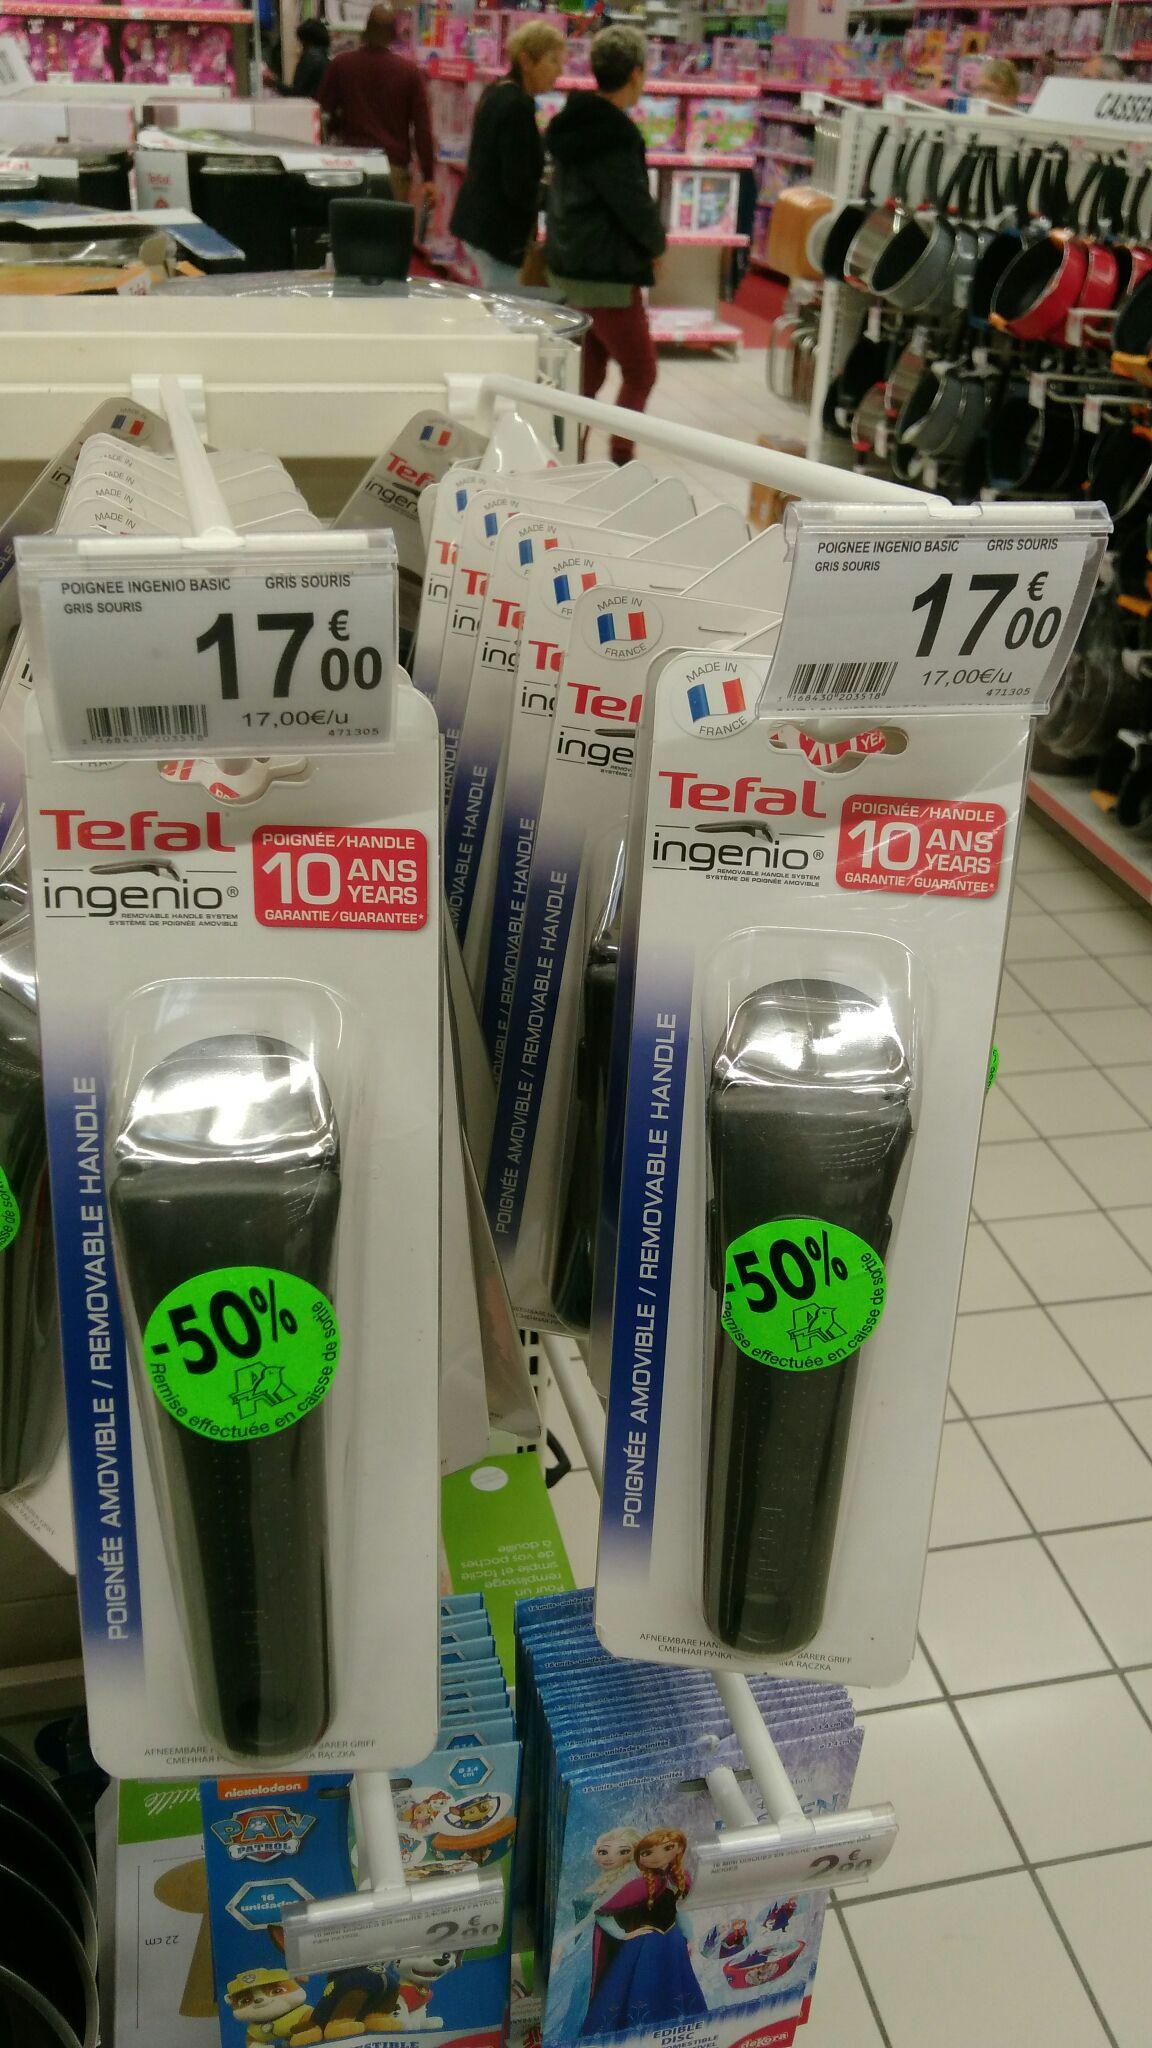 Poignée Tefal Ingenio - Auchan Macon (71)